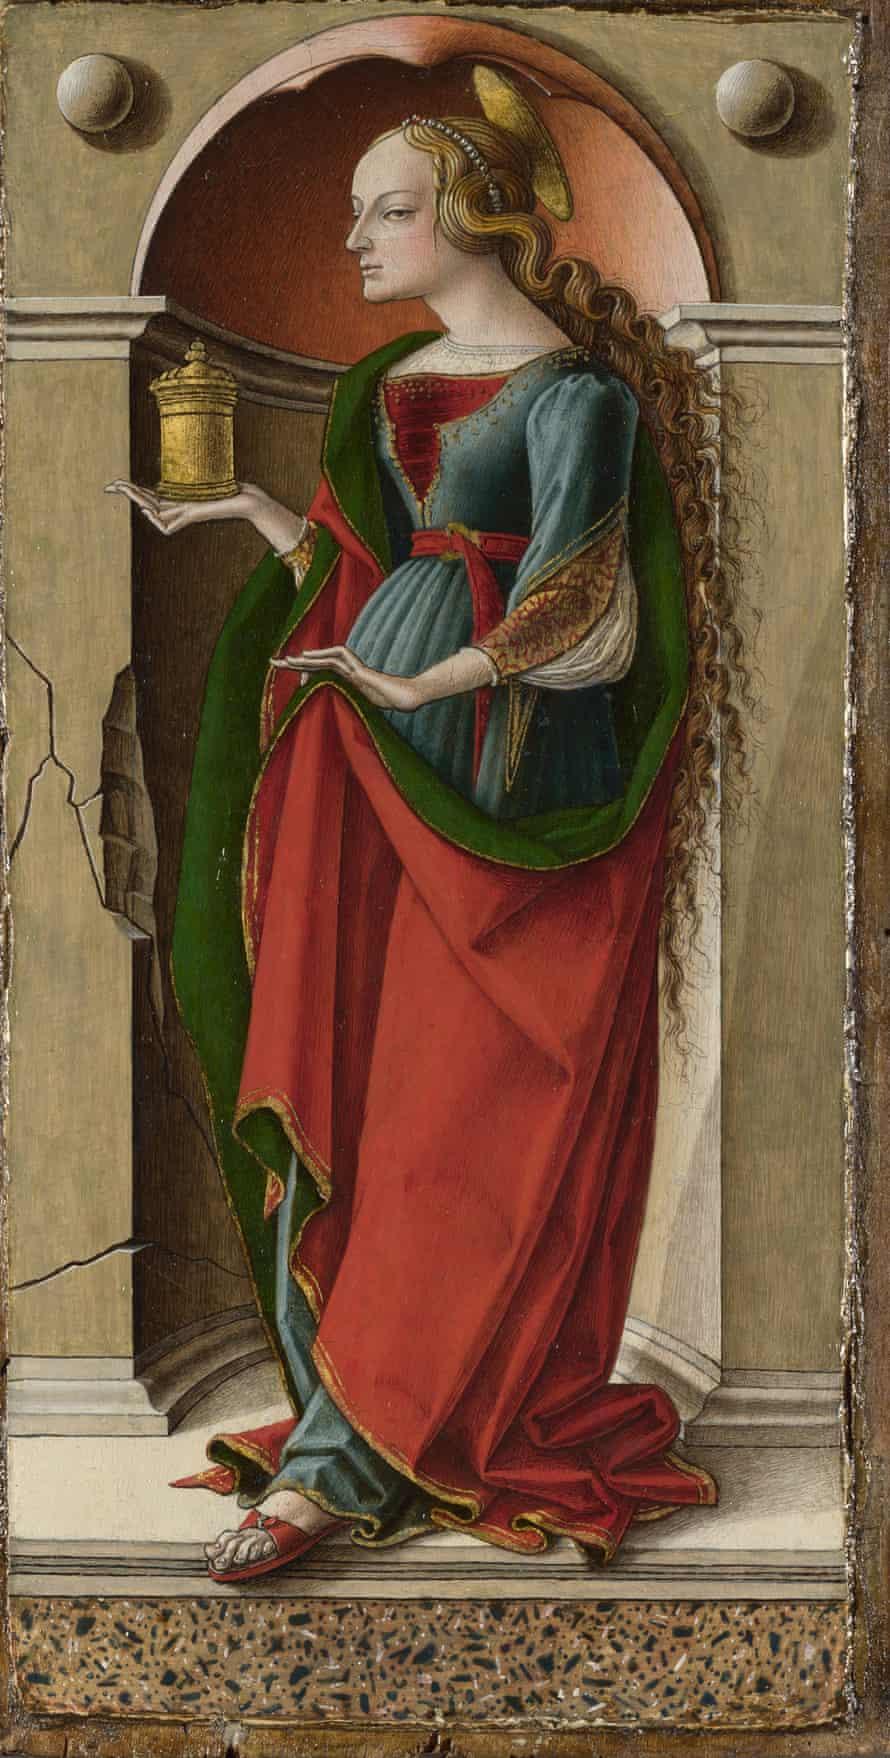 Carlo Crivelli, Saint Mary Magdalene